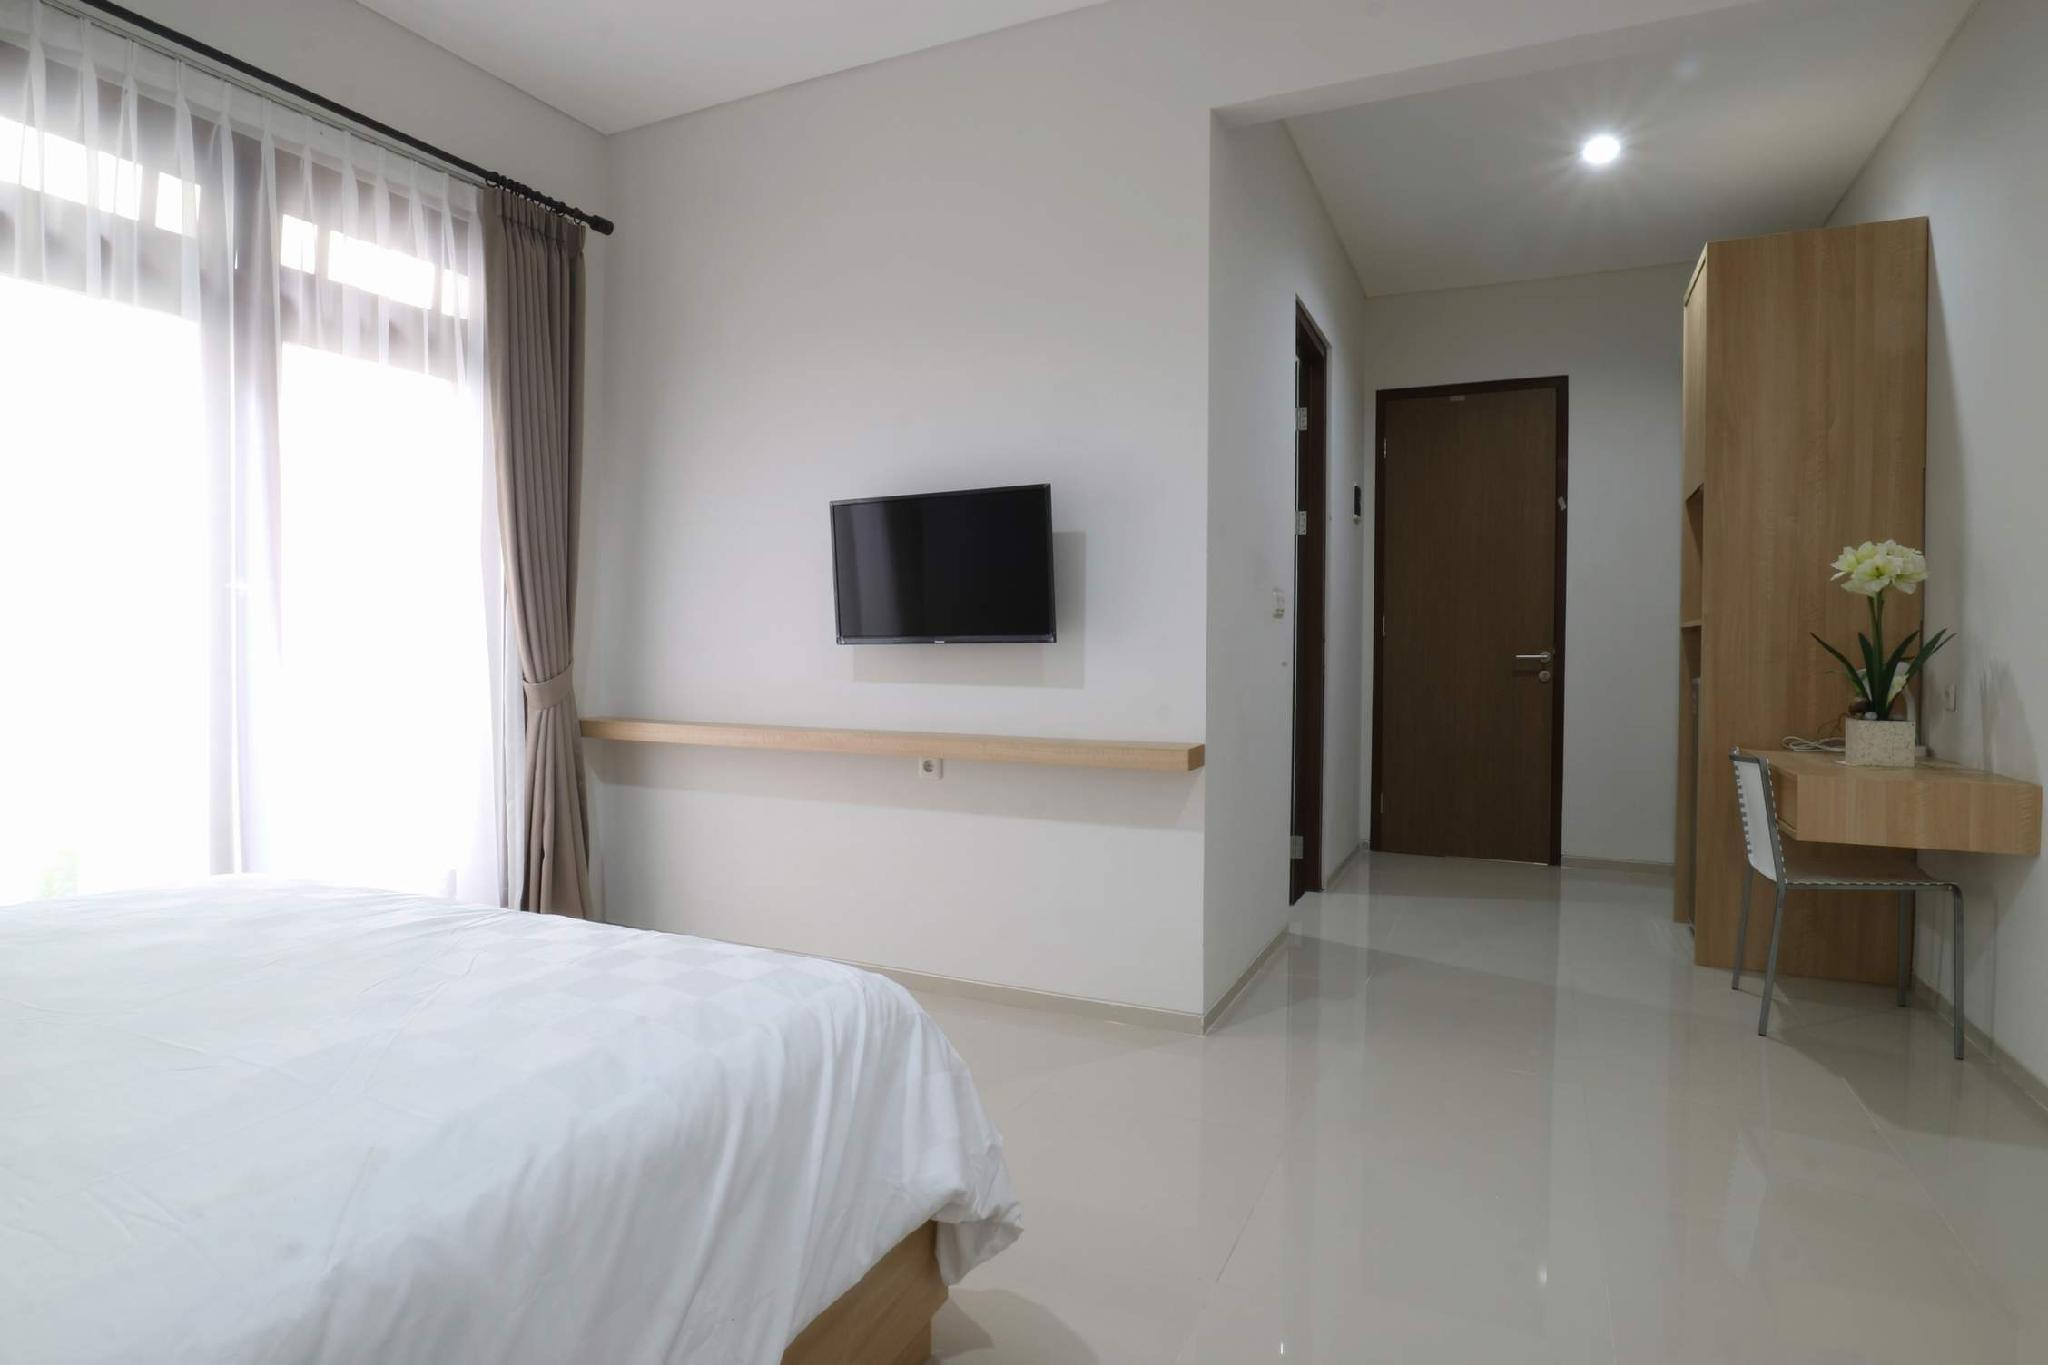 MK HOUSE TENDEAN, Jakarta Selatan